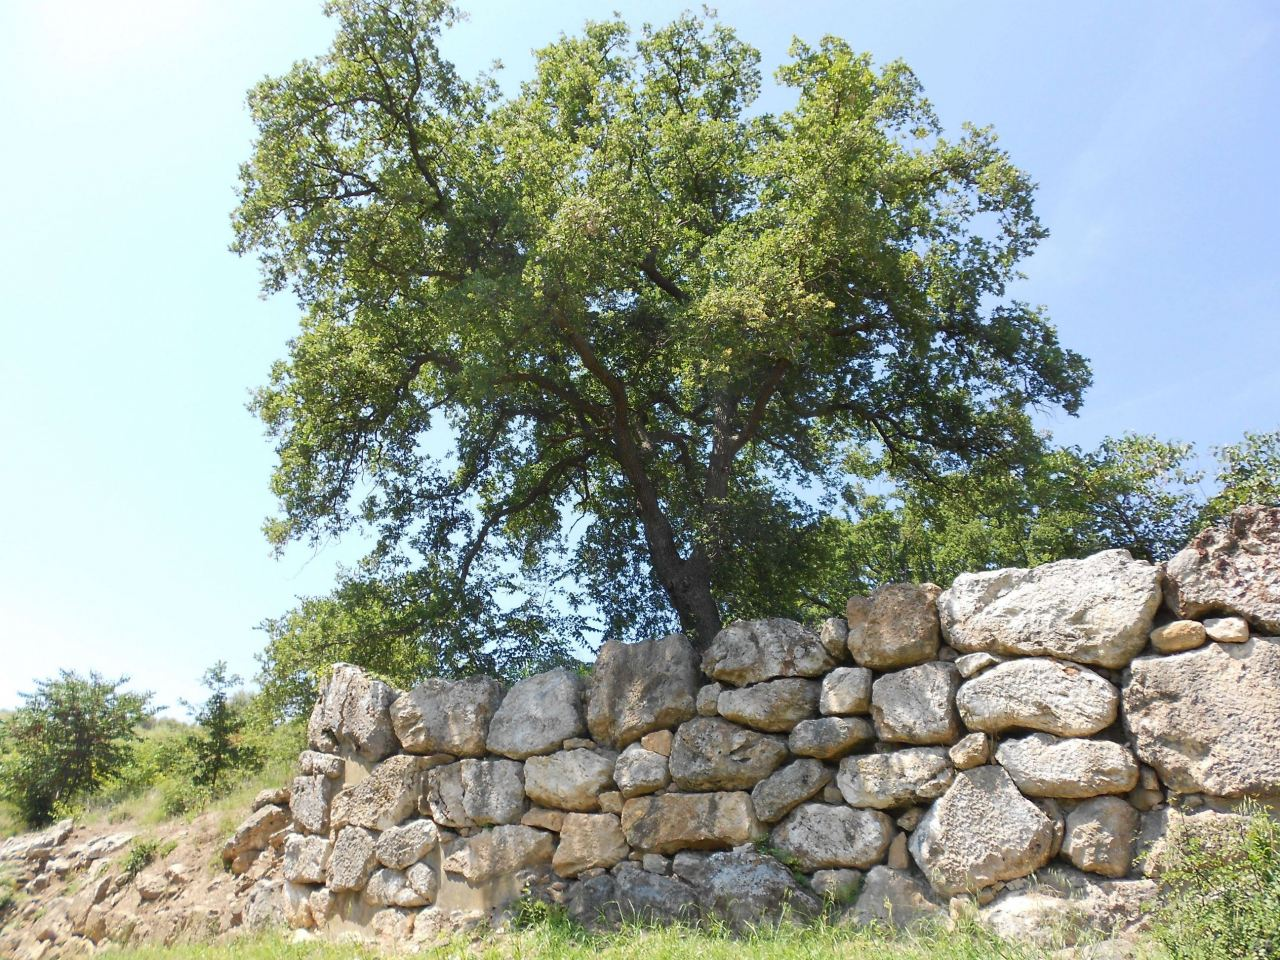 Roselle-Mura-Megalitiche-Roselle-Grosseto-Toscana-Italia-37